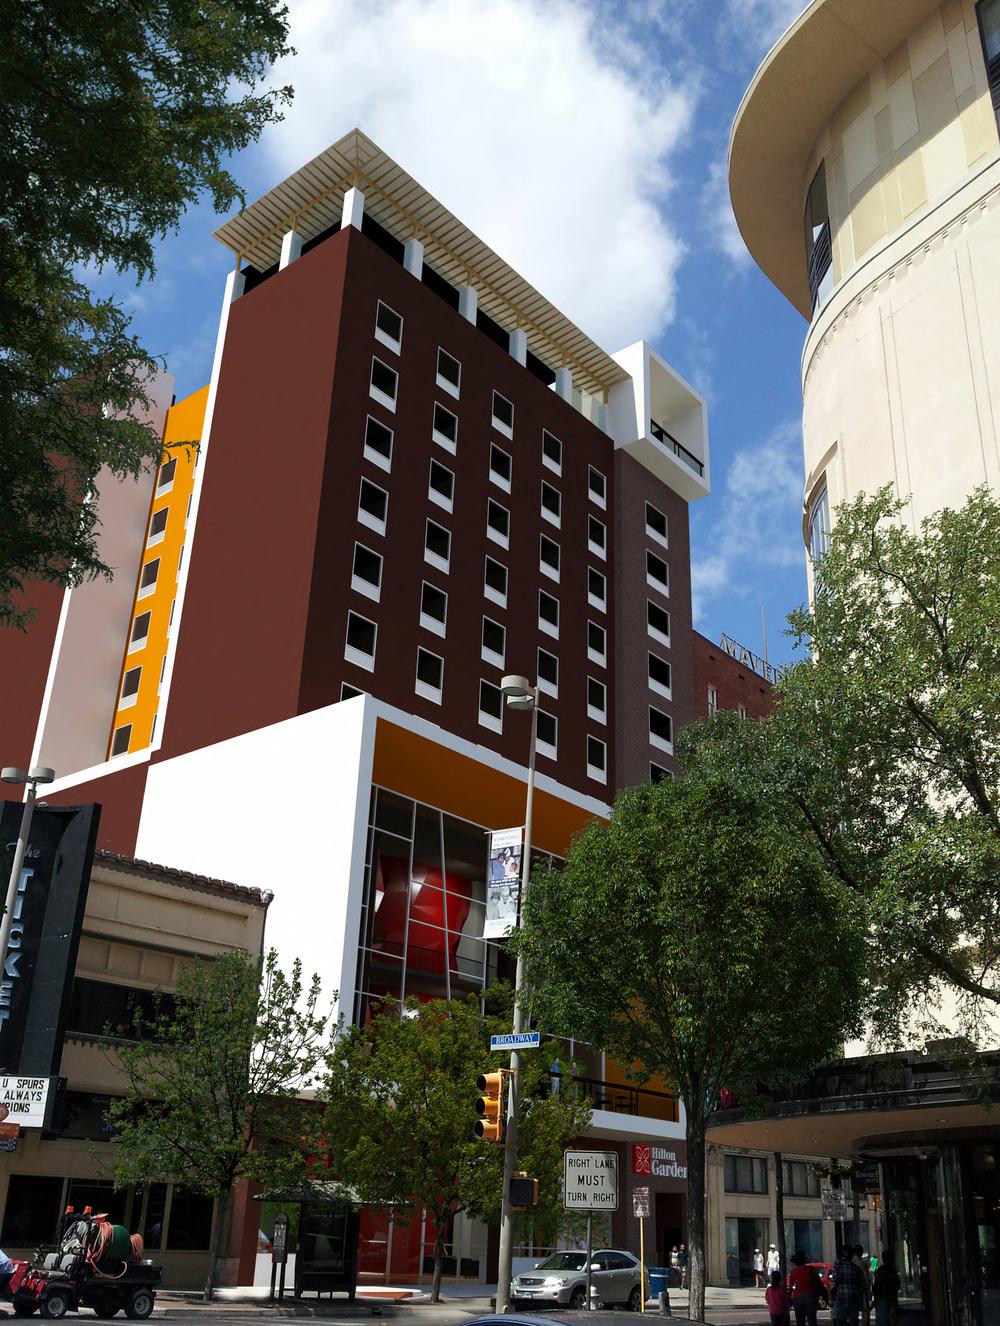 Hilton Garden Inn & Suites